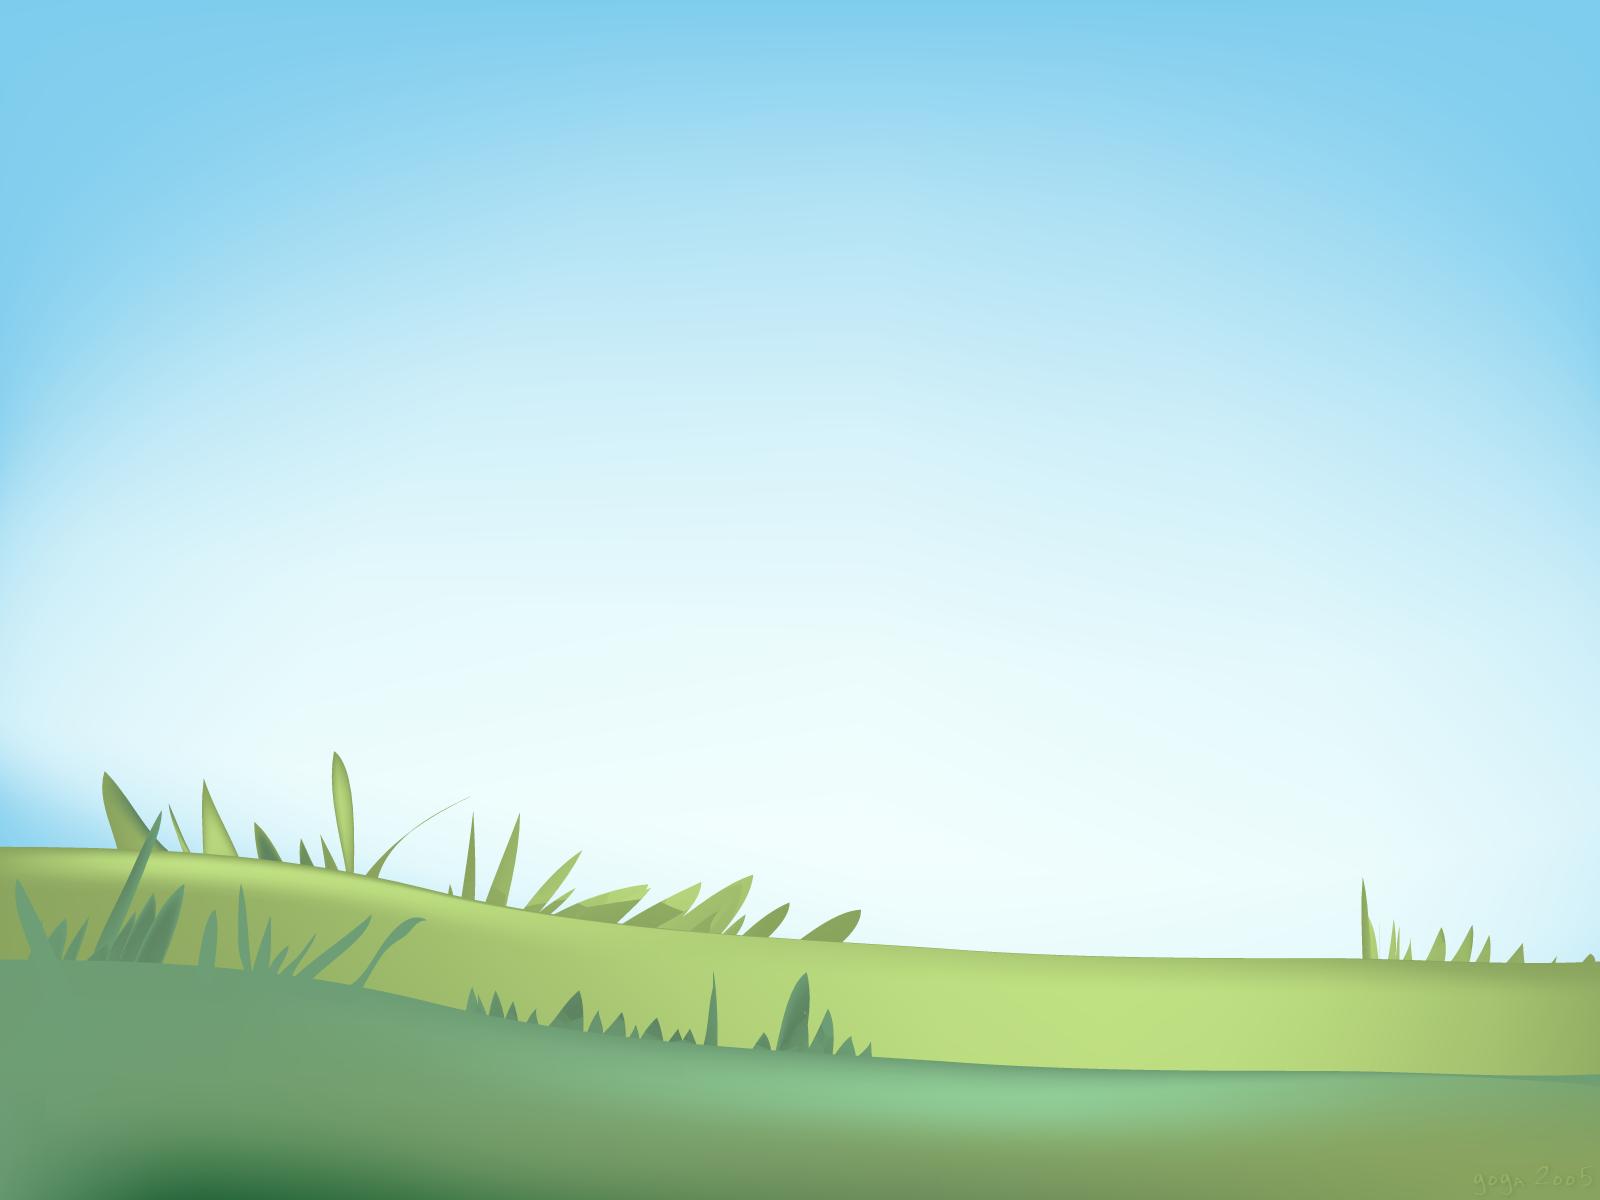 grass by arturog